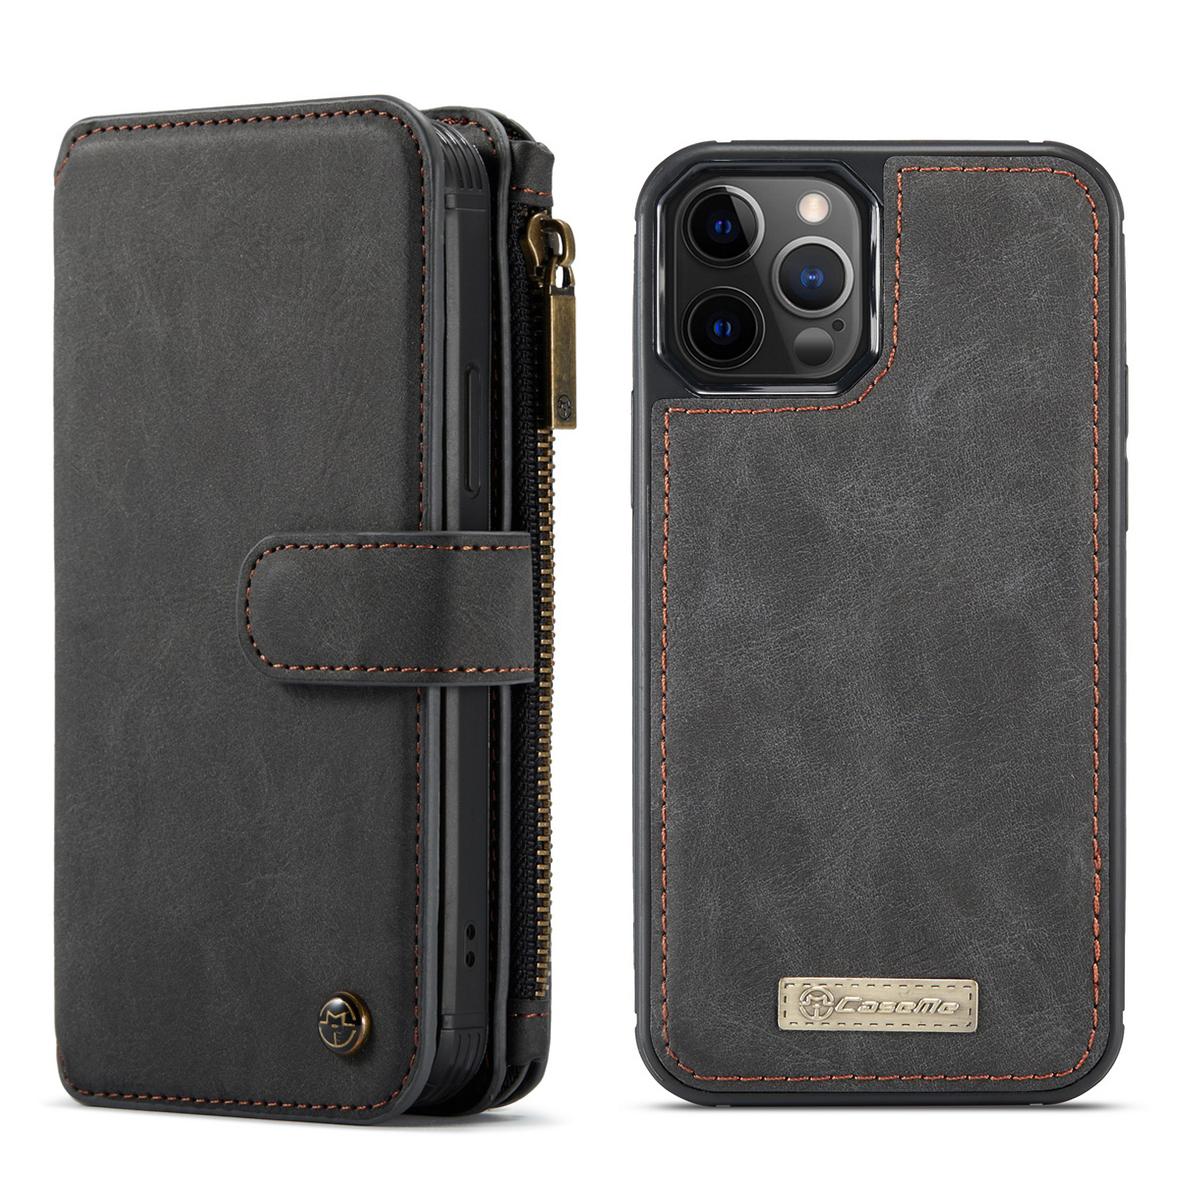 CaseMe läderfodral med magnetskal, iPhone 12/12 Pro, svart